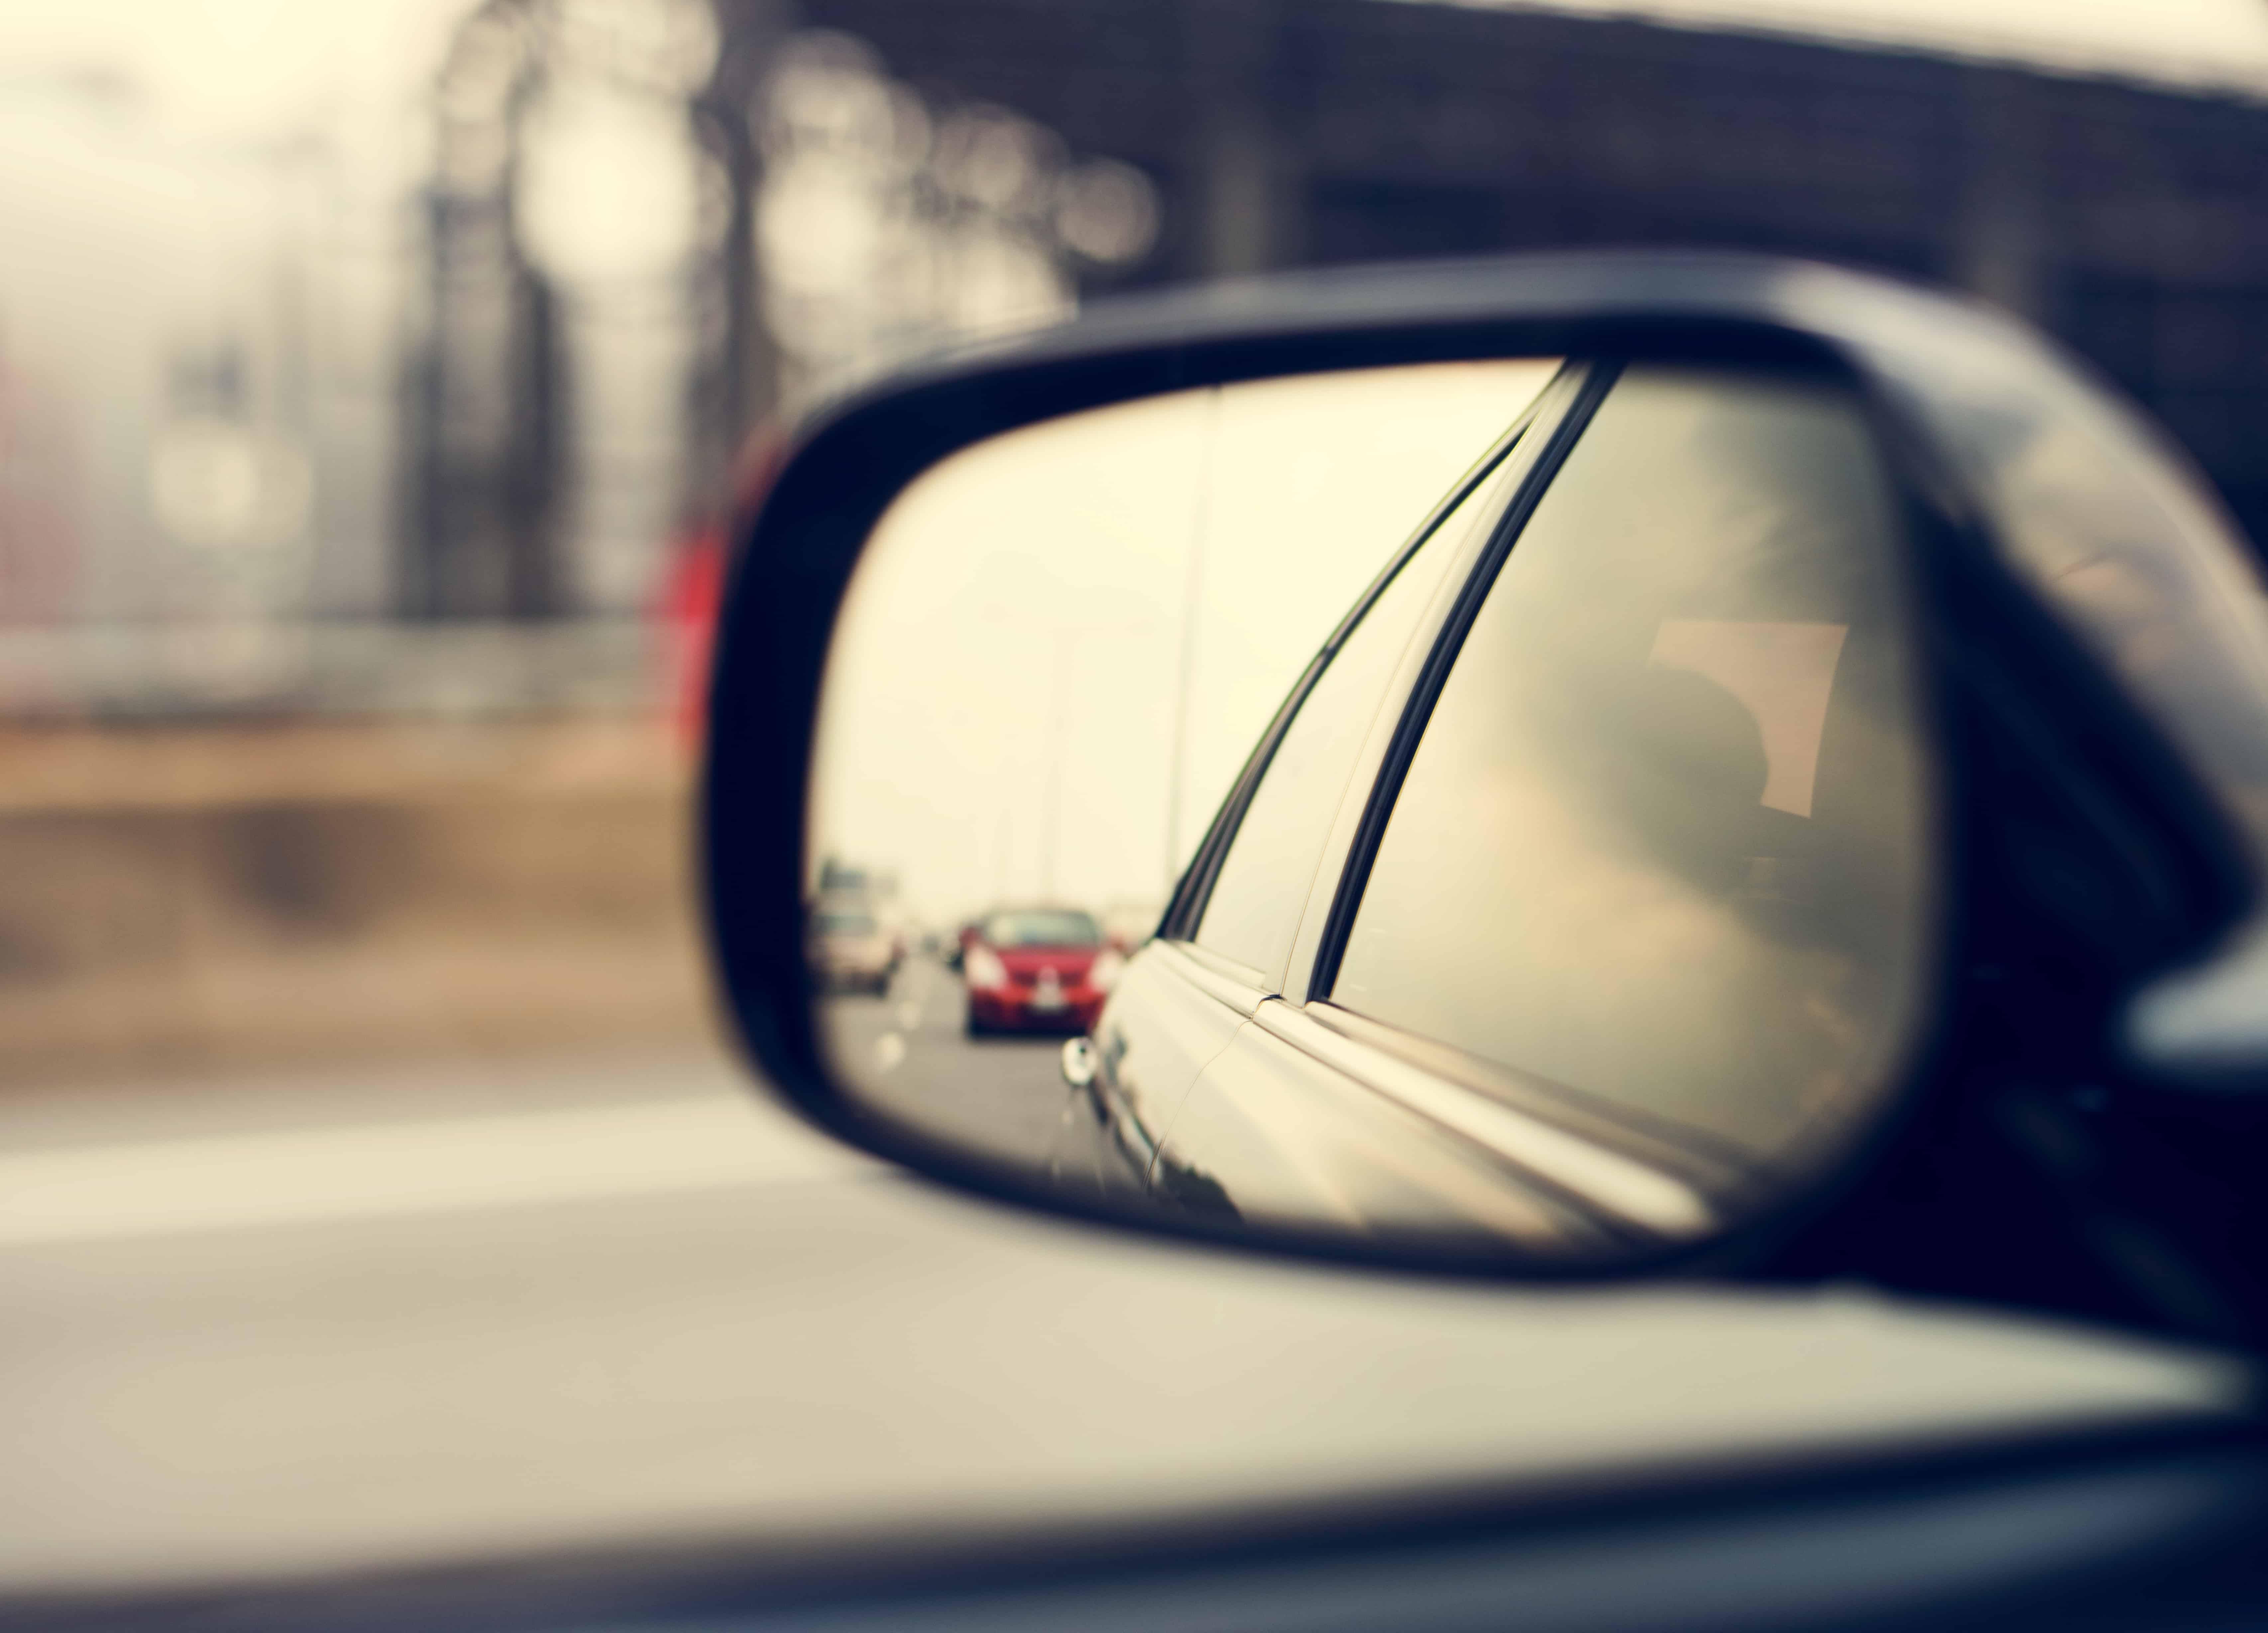 2 People Dead in Head-on Crash on Highway 65 near James Road [Bakersfield, CA]